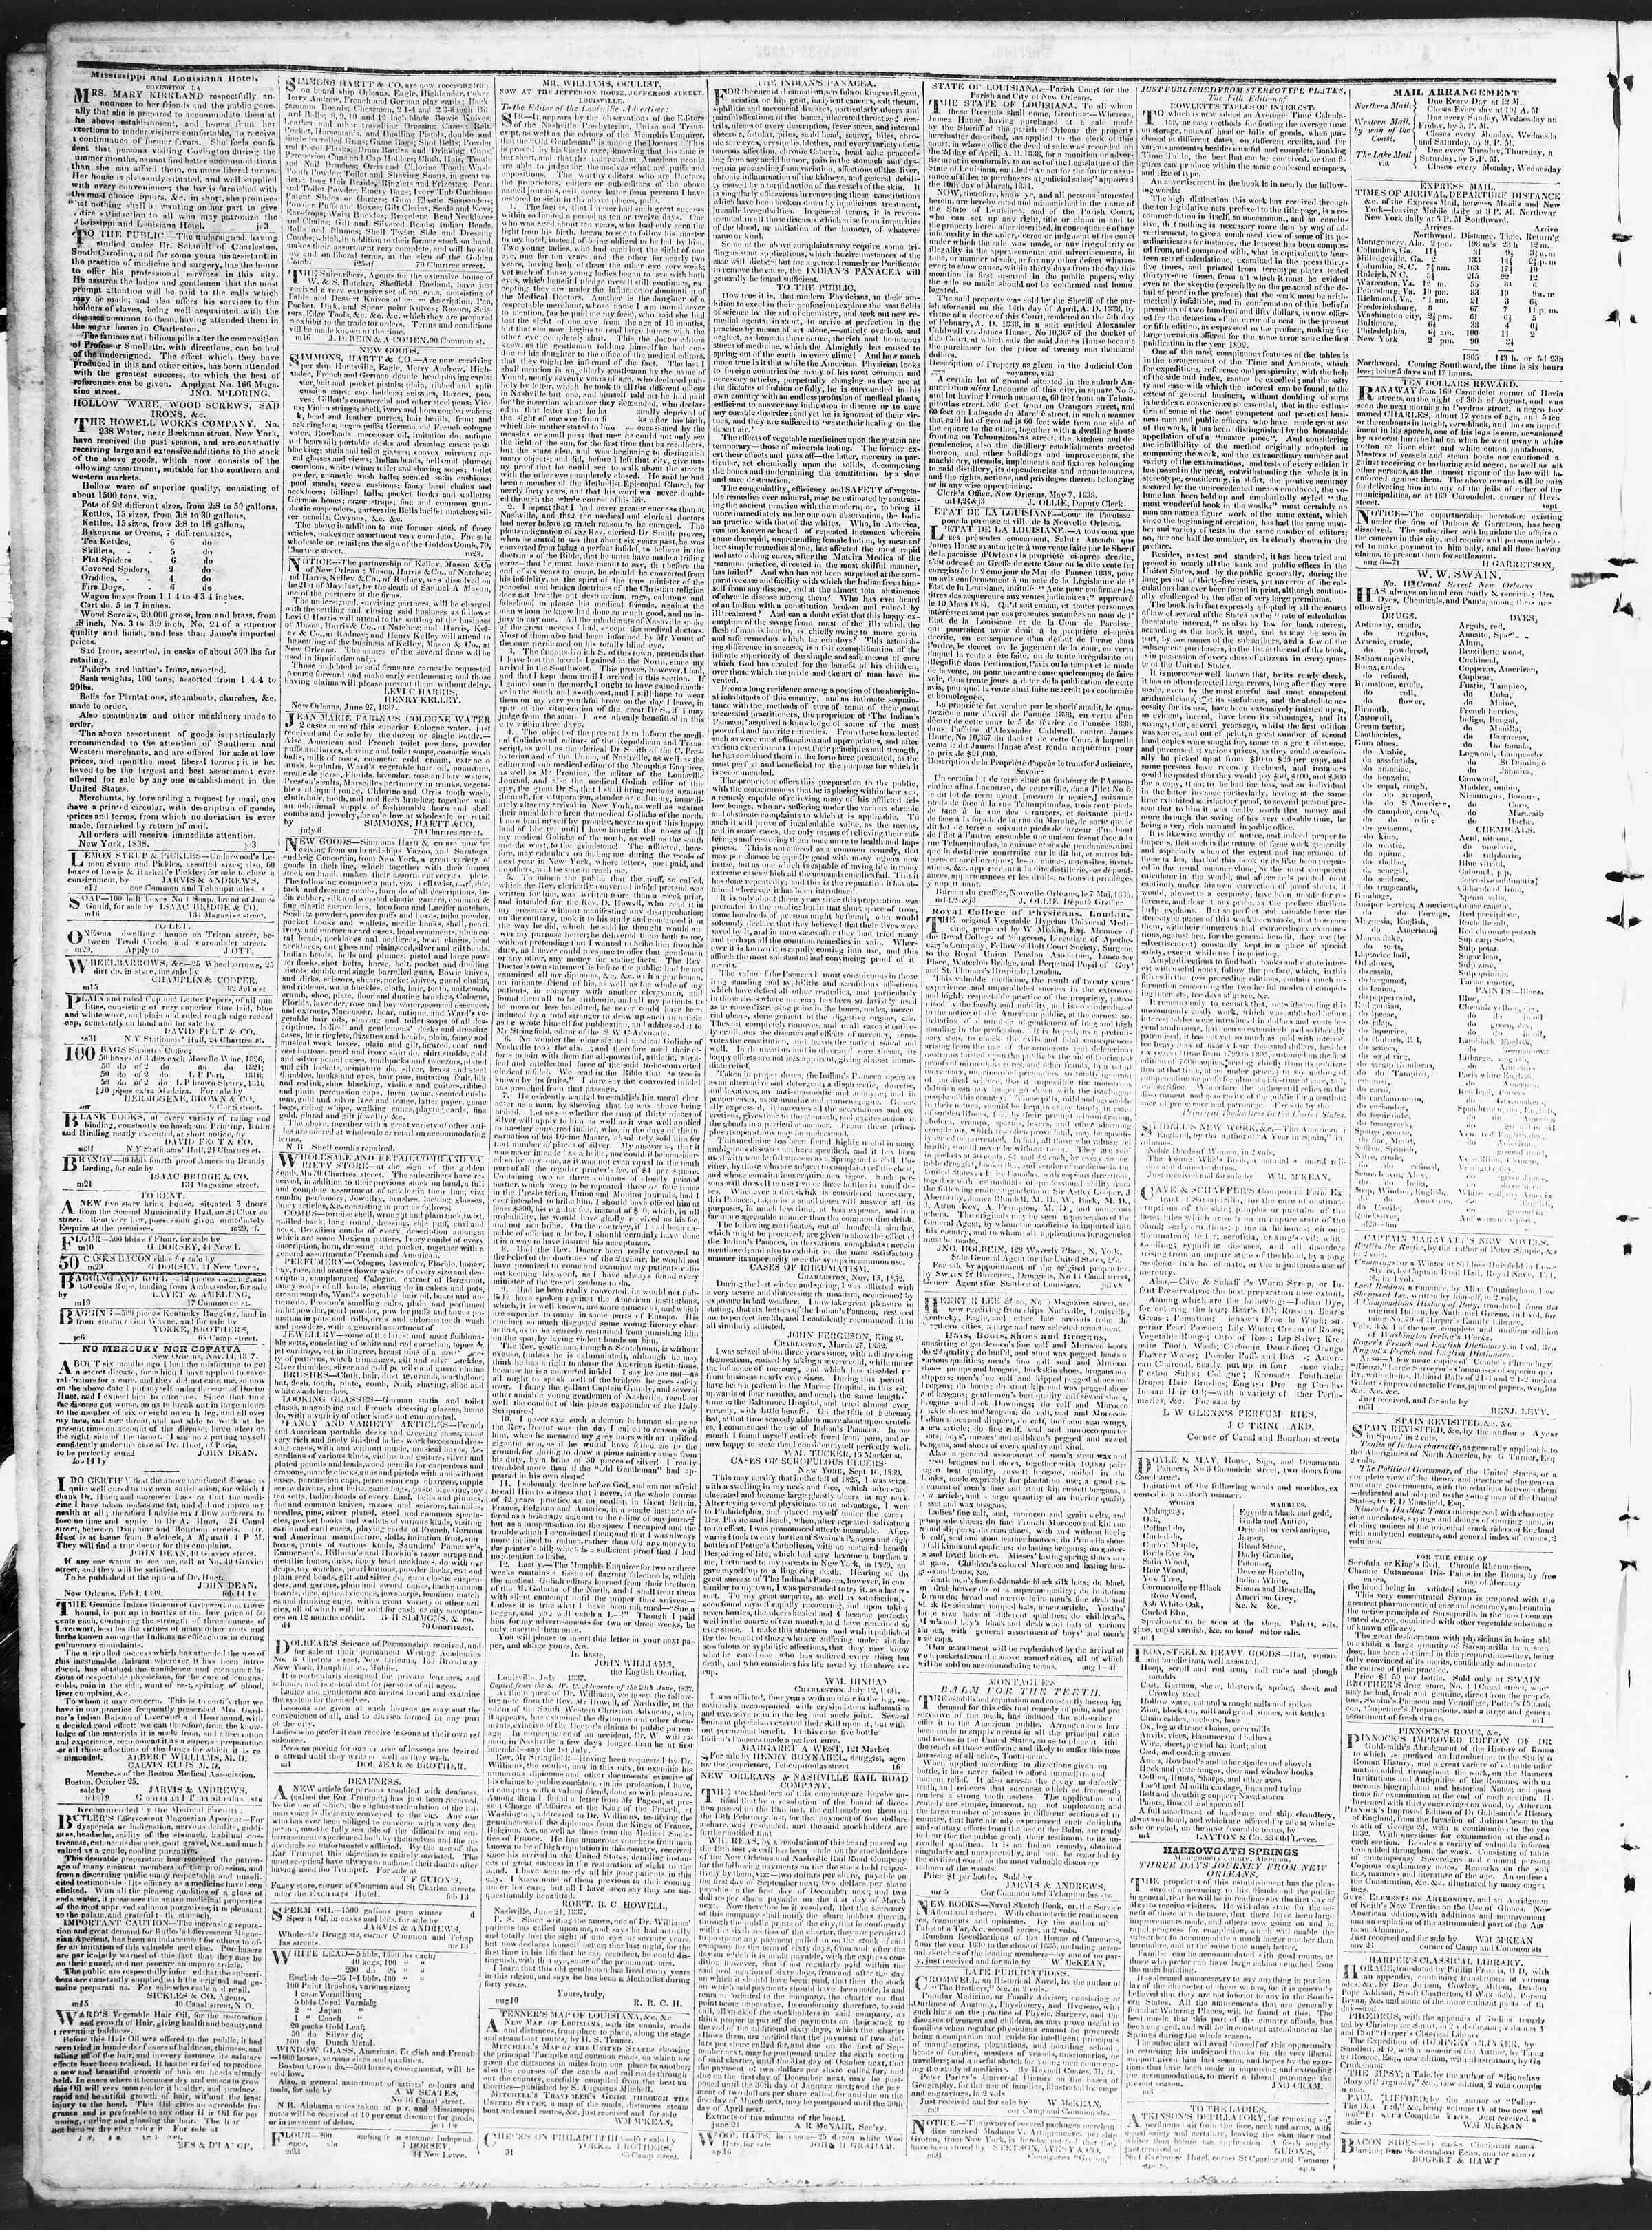 November 17, 1838 Tarihli True American Gazetesi Sayfa 4